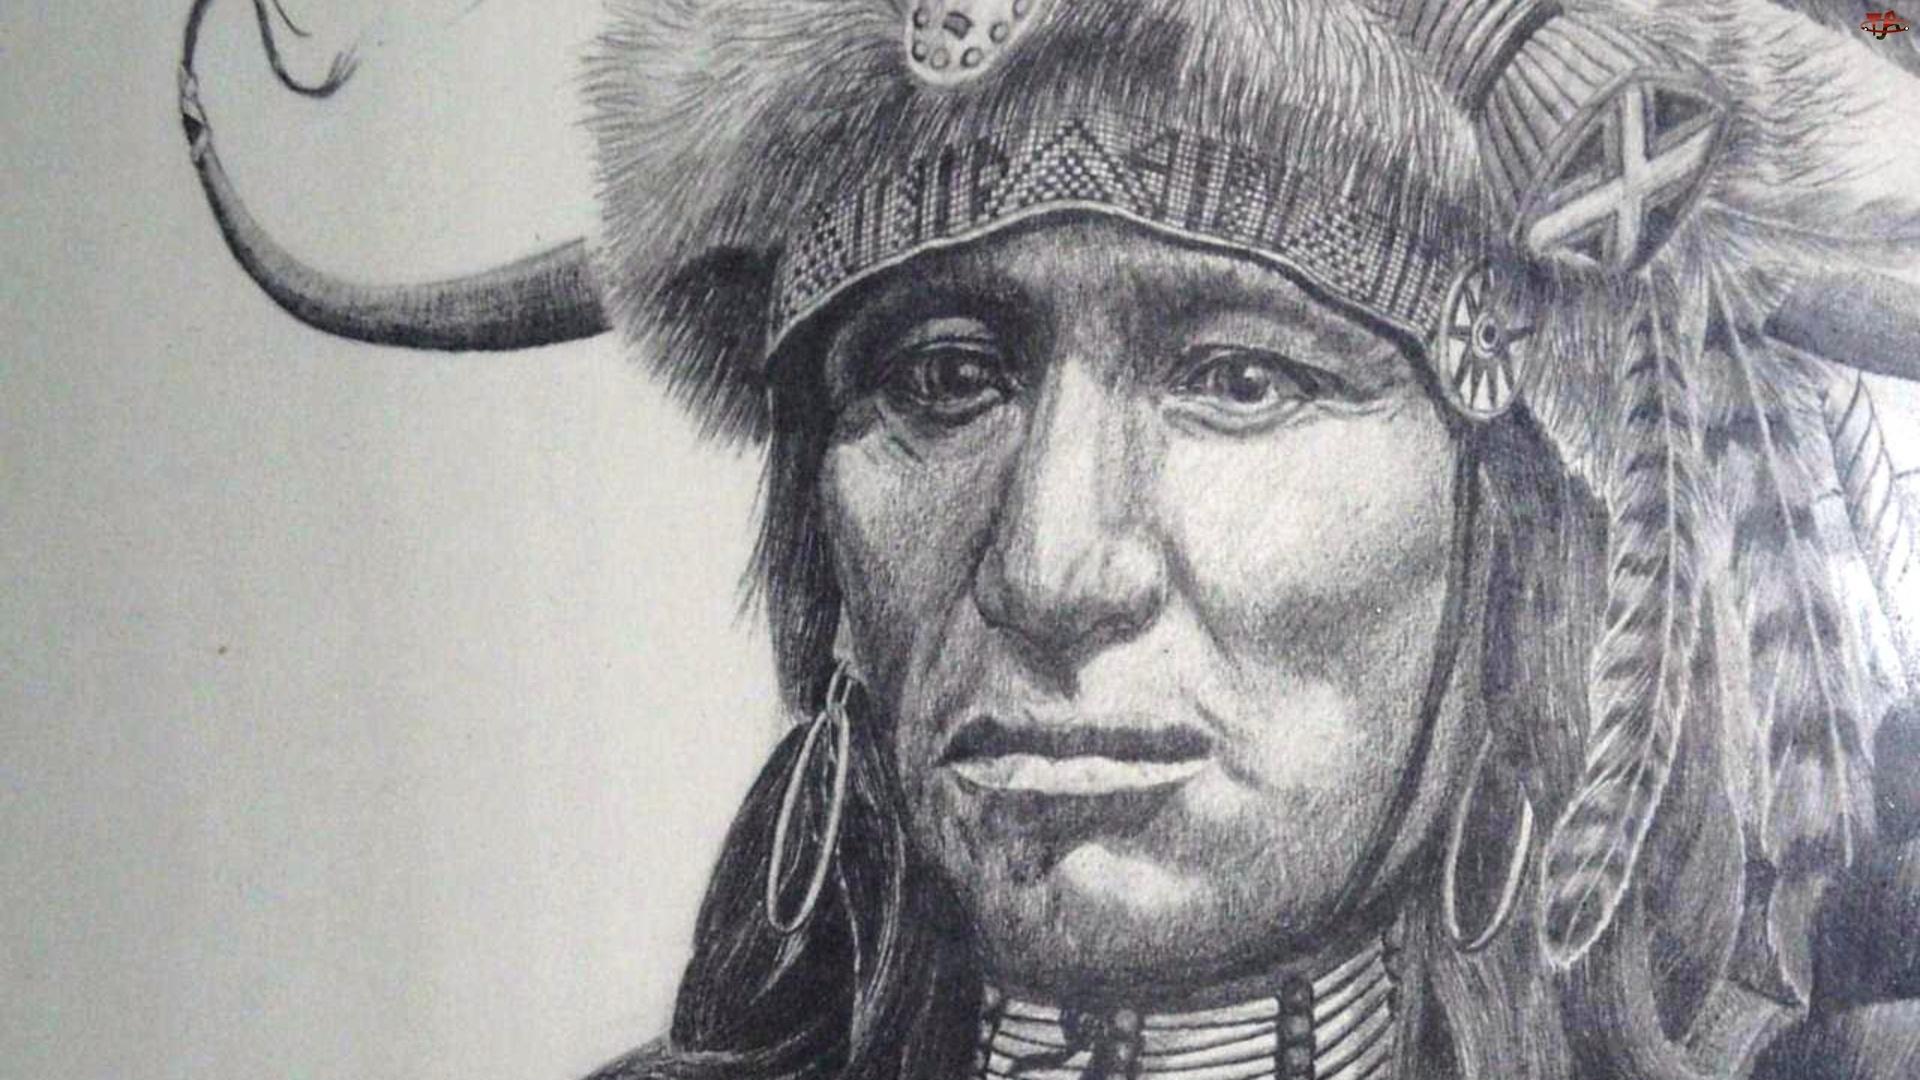 Indianin, Pióropusz